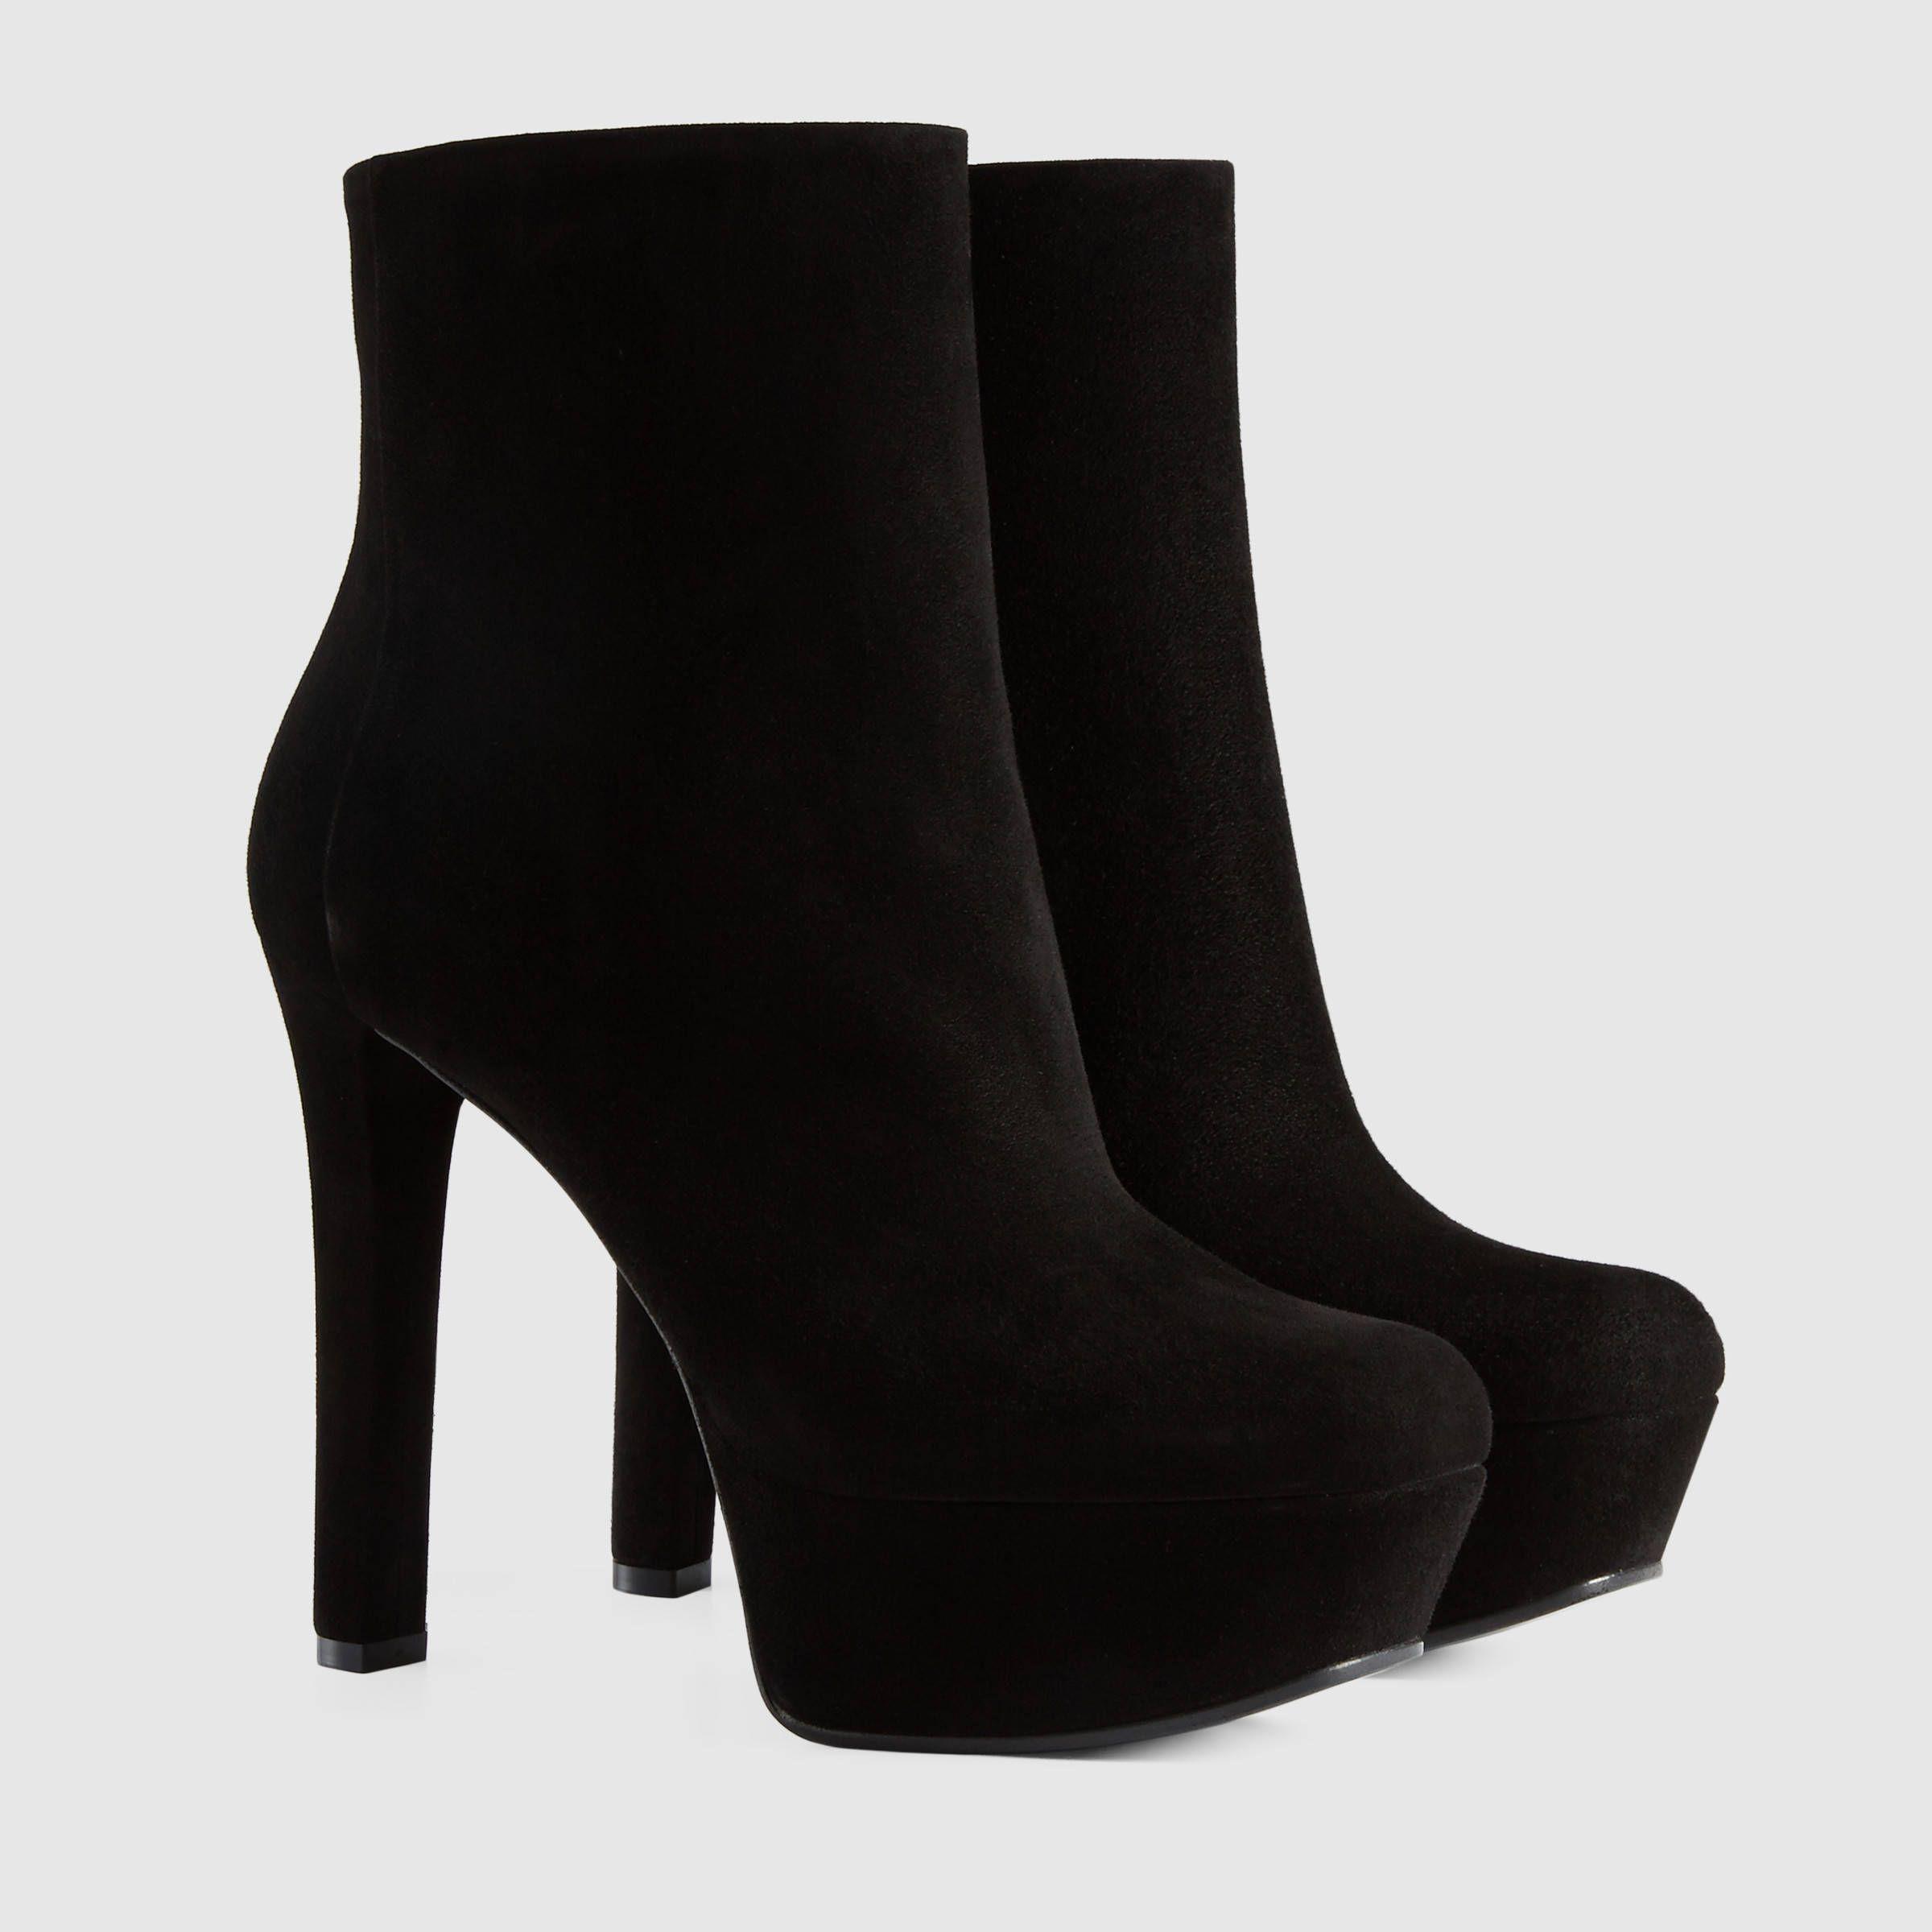 348f34da8714 Gucci Women - Leila suede platform ankle boot -  995